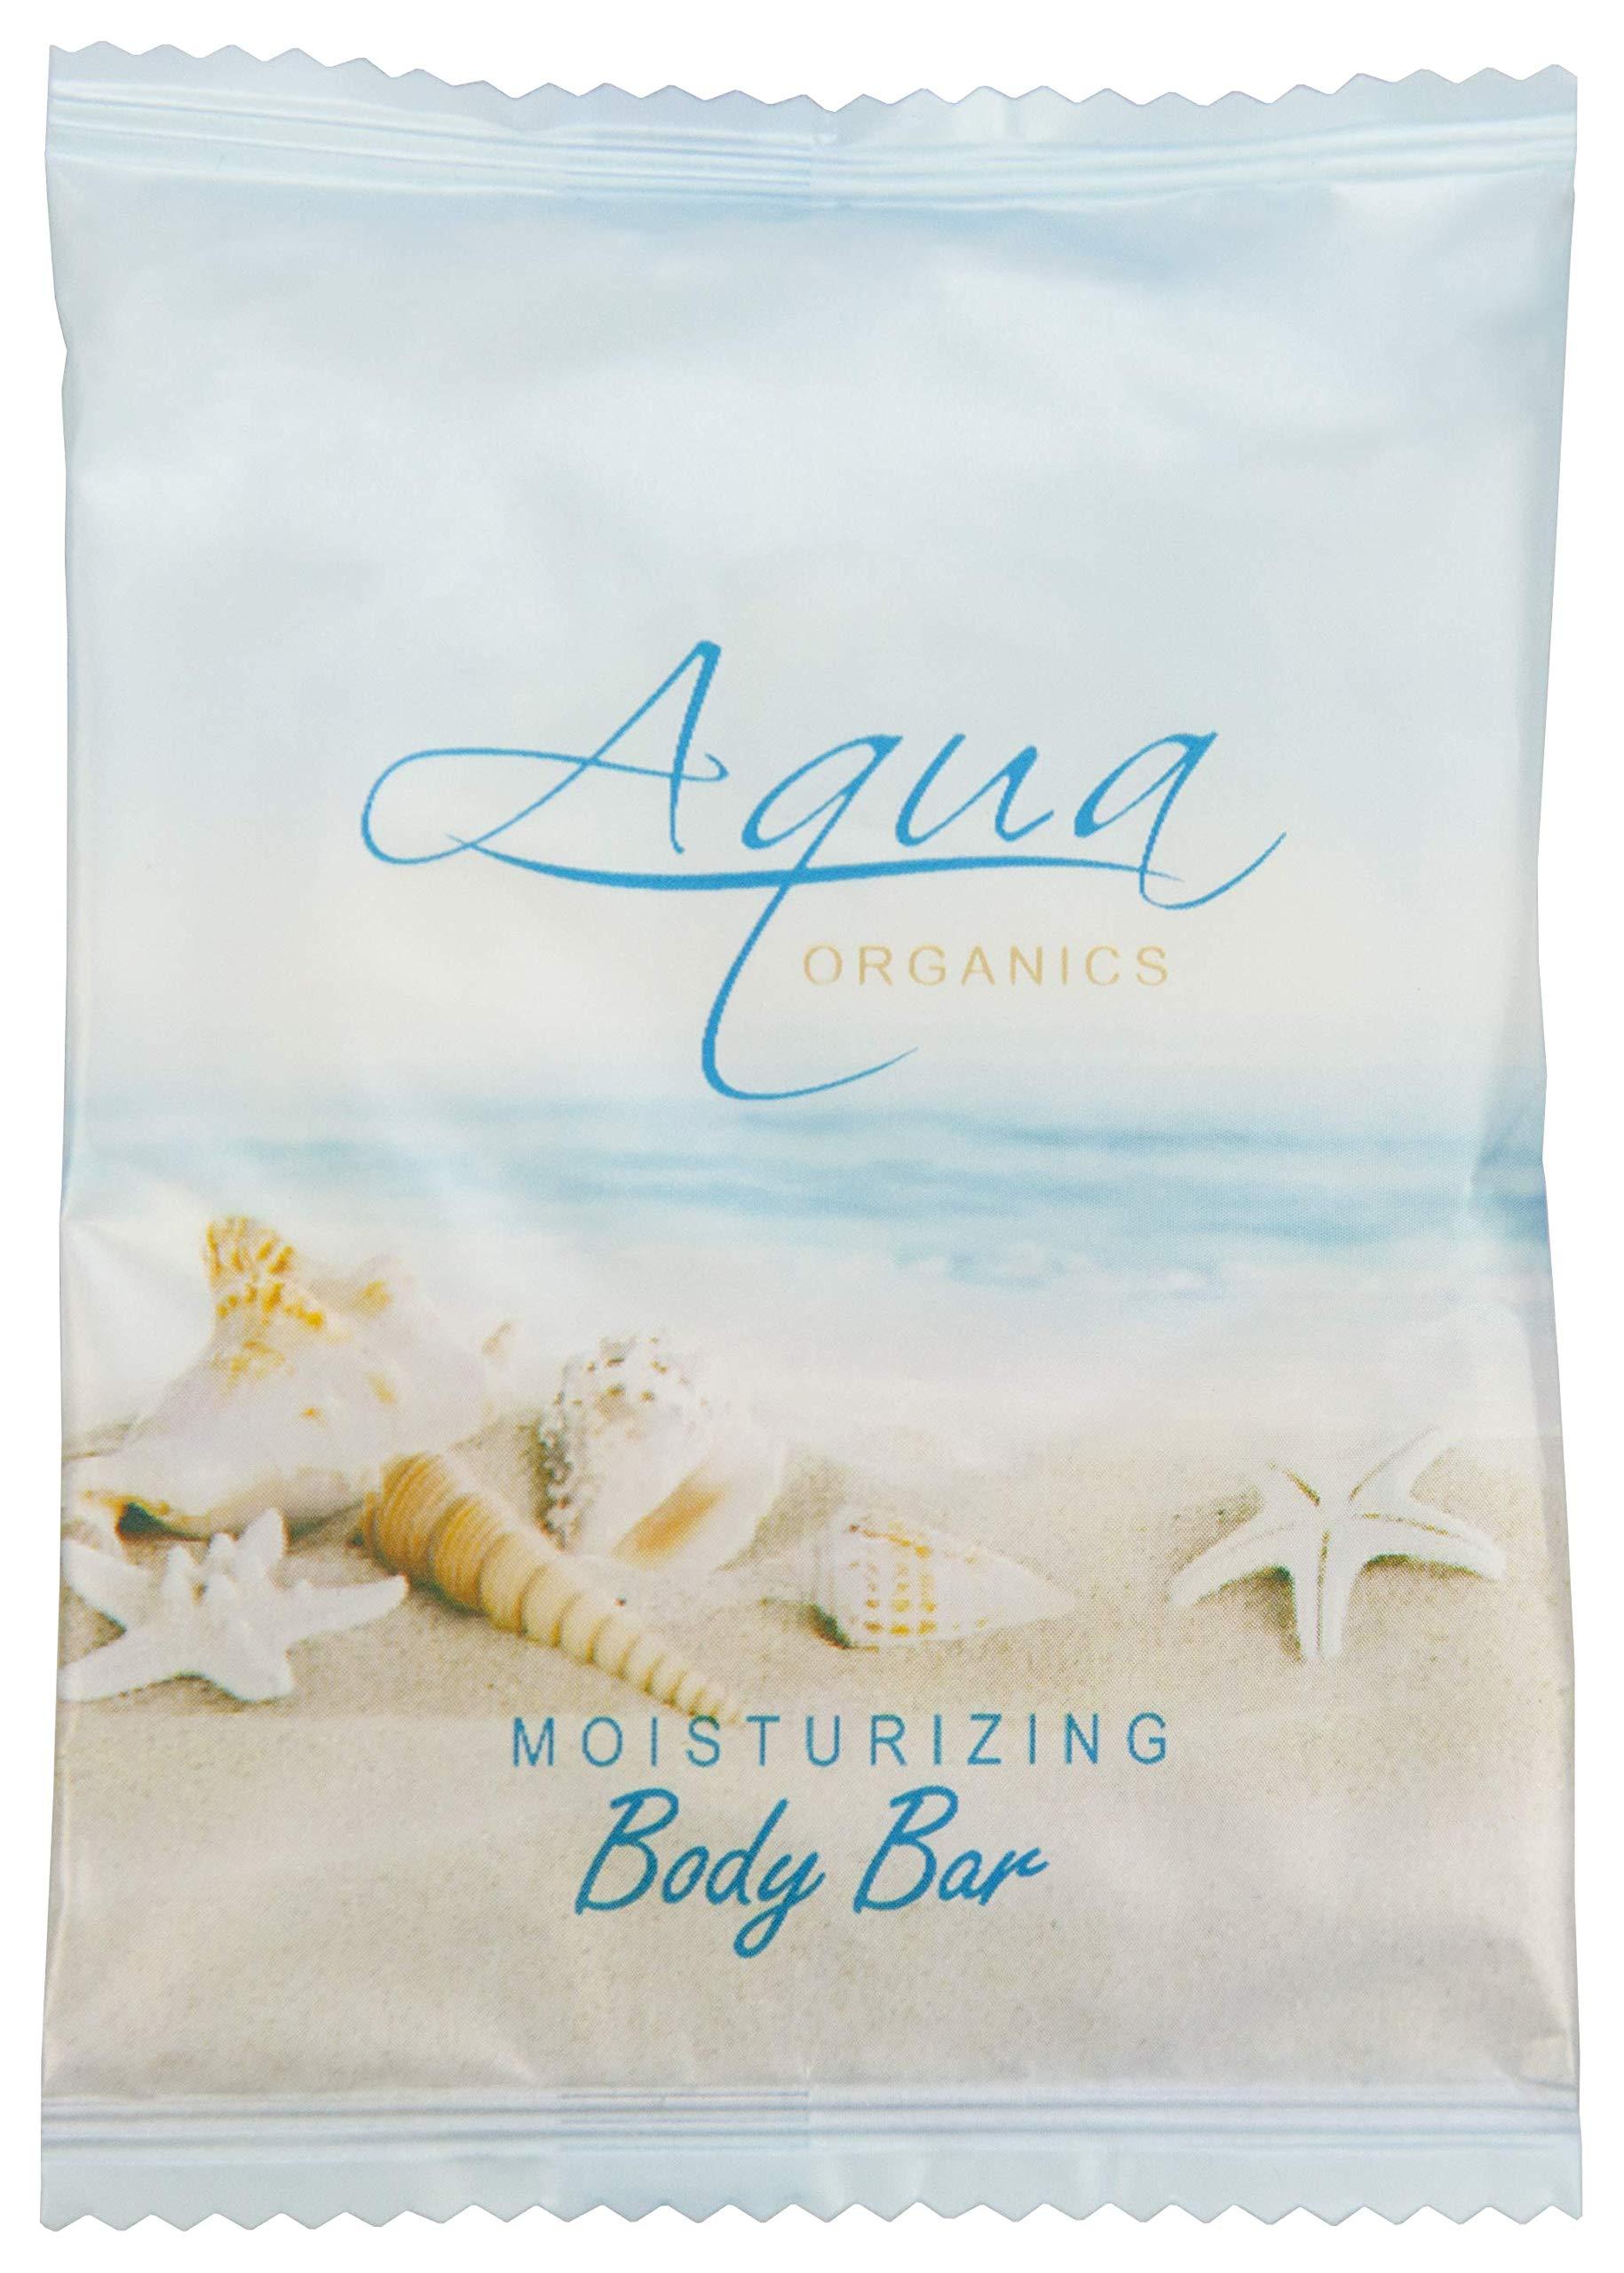 Aqua Organics Bar Soap, Travel Size Beach Hotel Amenities, 1 oz (Case of 500)